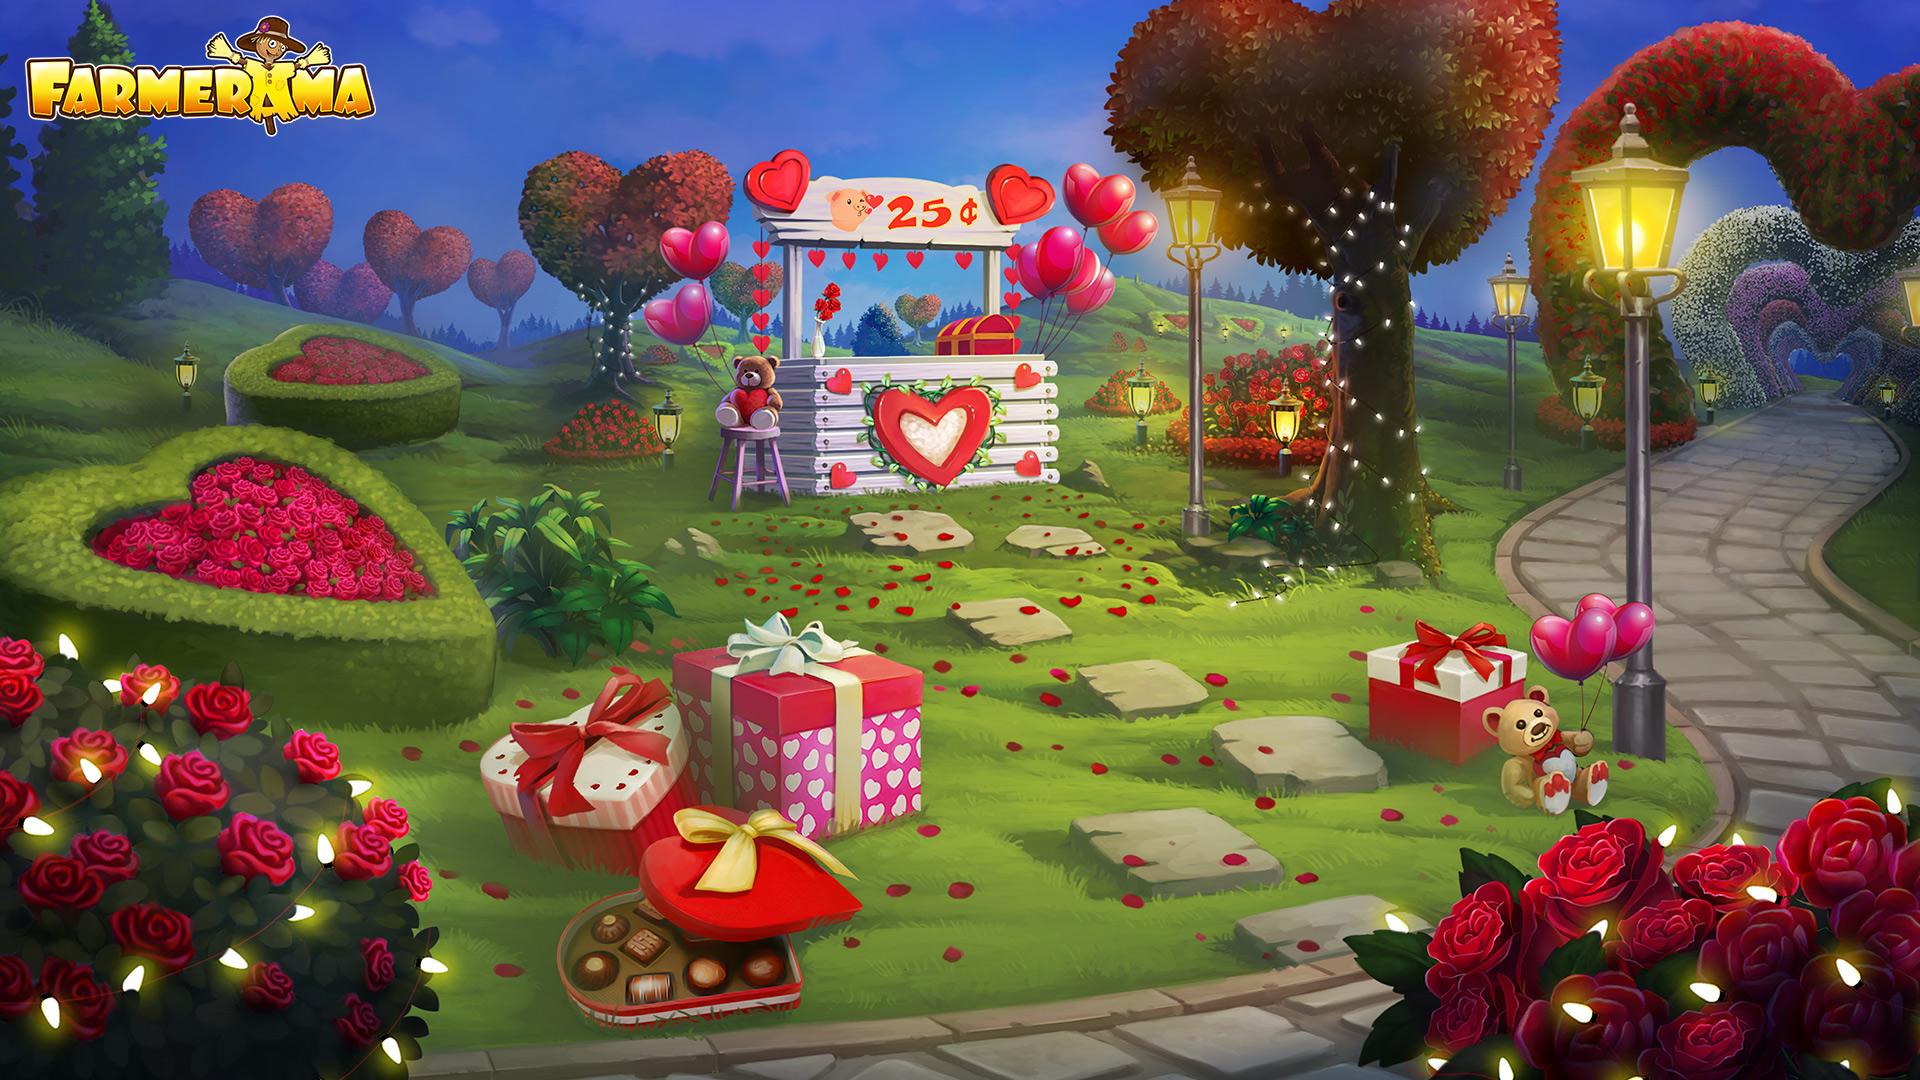 valentines2018_wallpaper_no-character.jpg